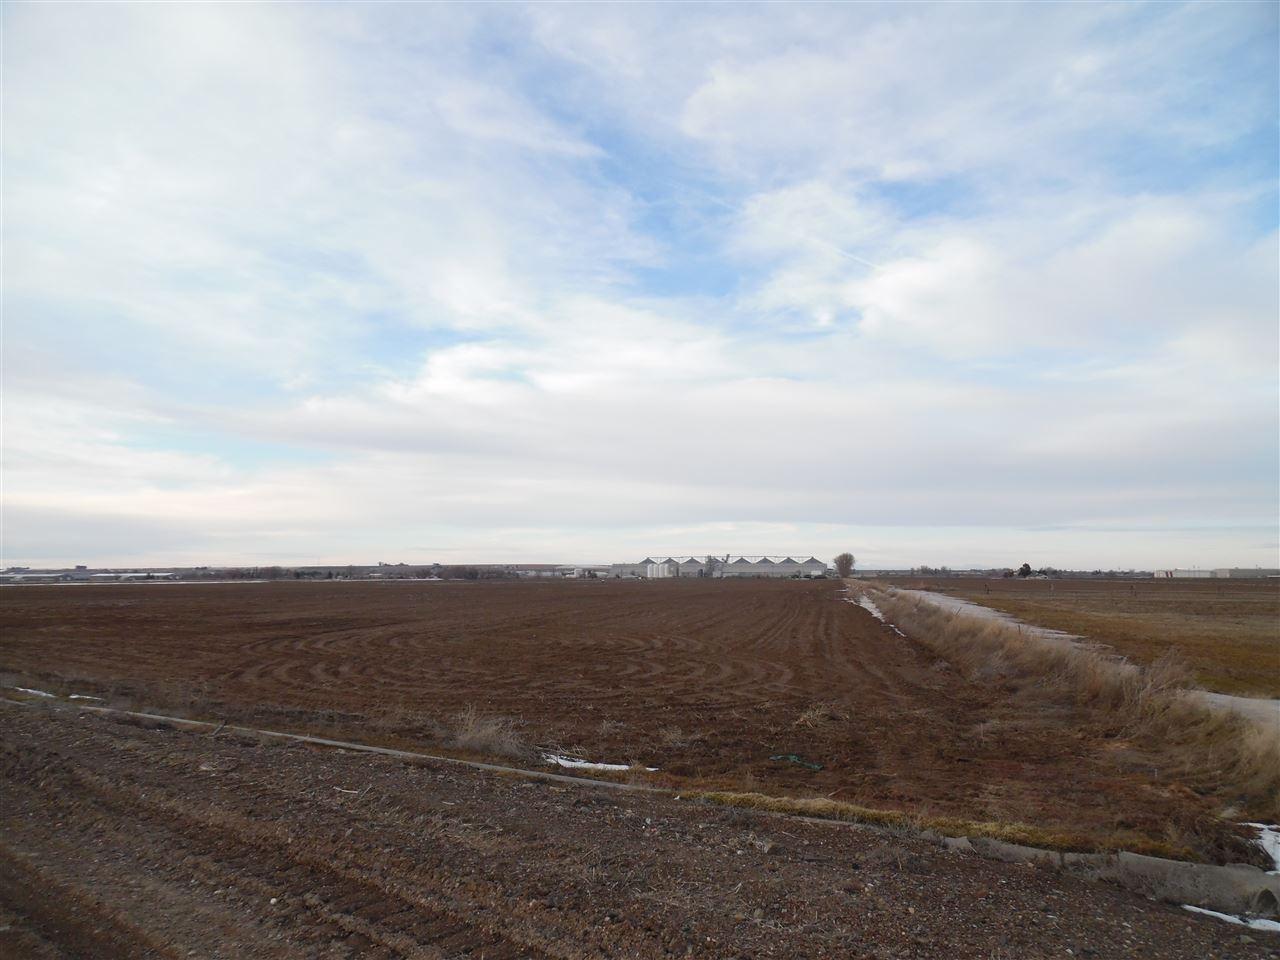 农场 为 销售 在 351 W Hwy 30 351 W Hwy 30 Burley, 爱达荷州 83318